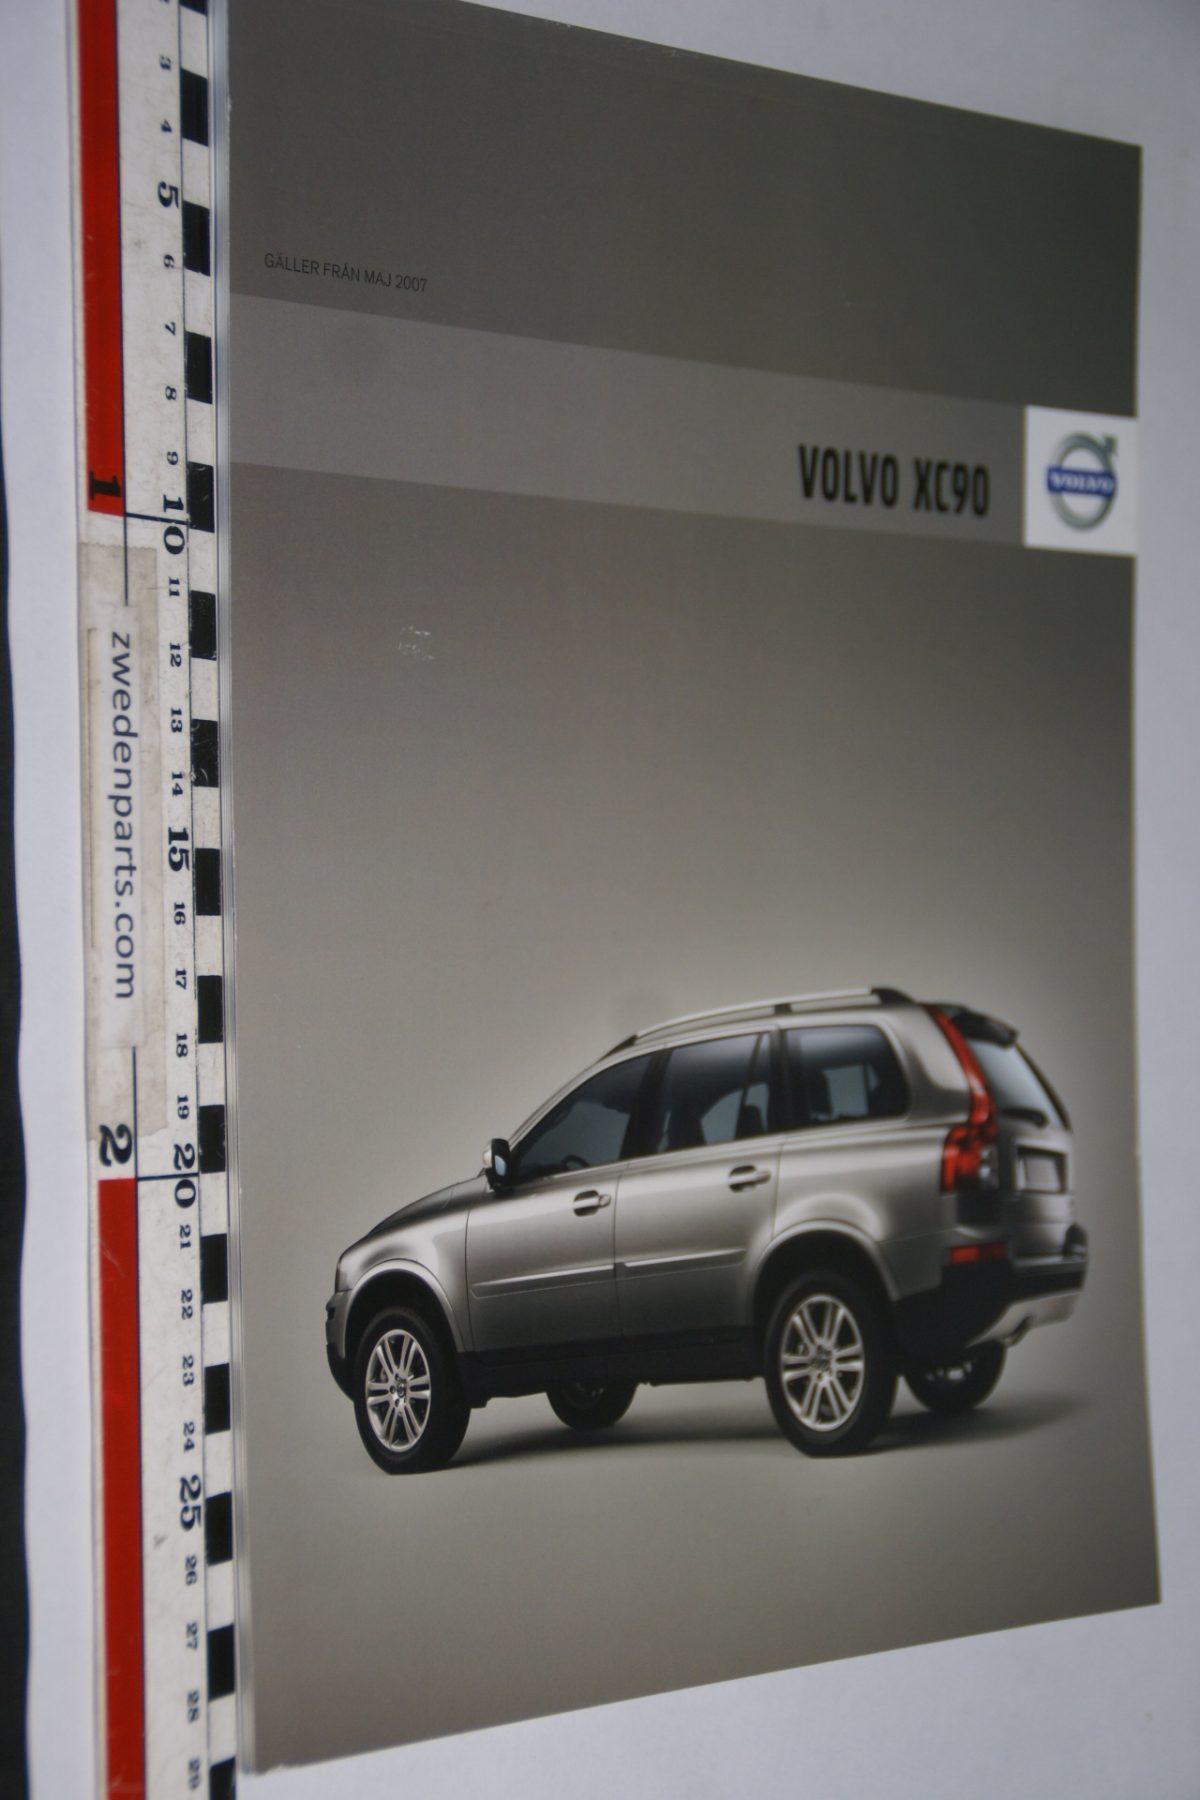 DSC06050 2008 brochure Volvo XC90 nr. SP-XC90-00001 0108.VBPV 9-08